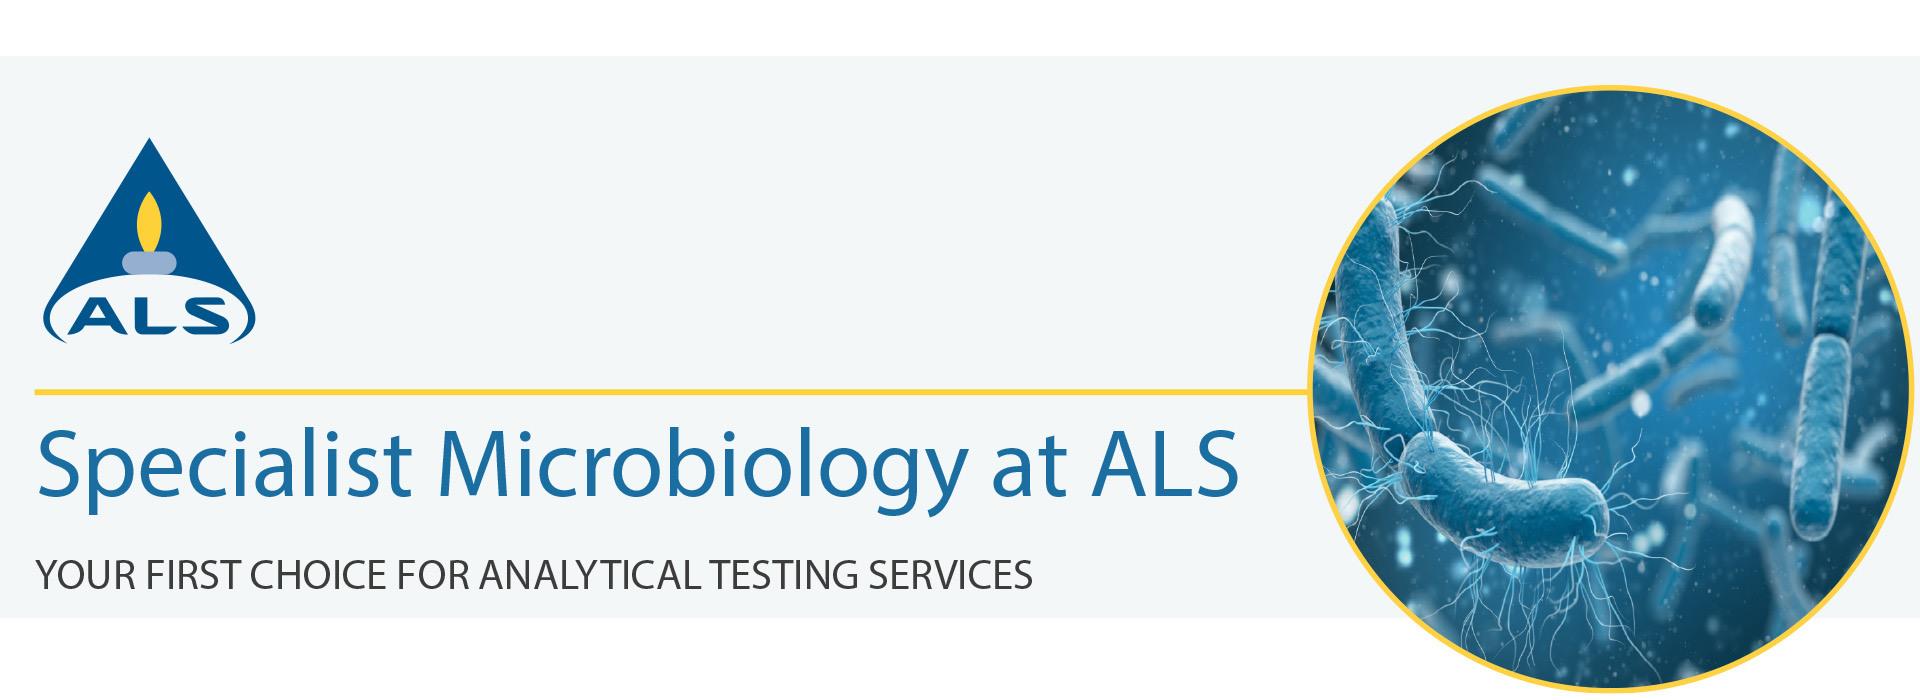 ALS MICROBIOLOGY